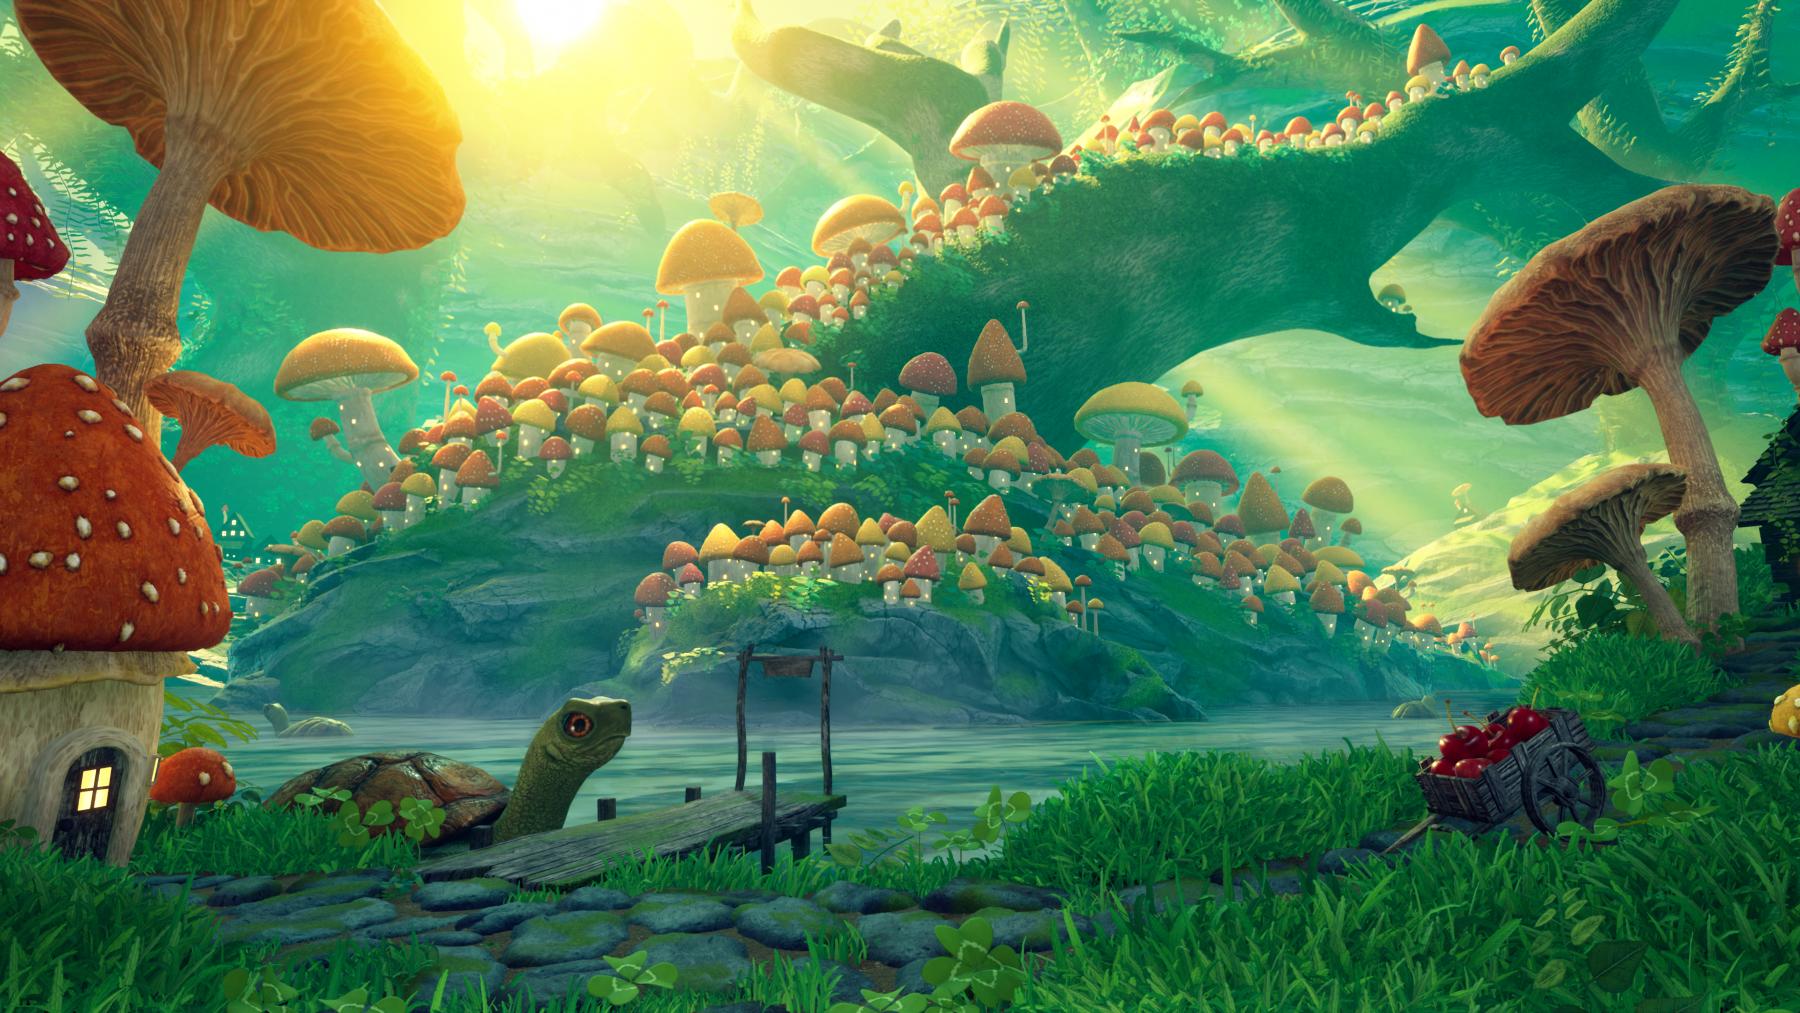 Bright, fantastical, lush world full of building sized mushrooms.